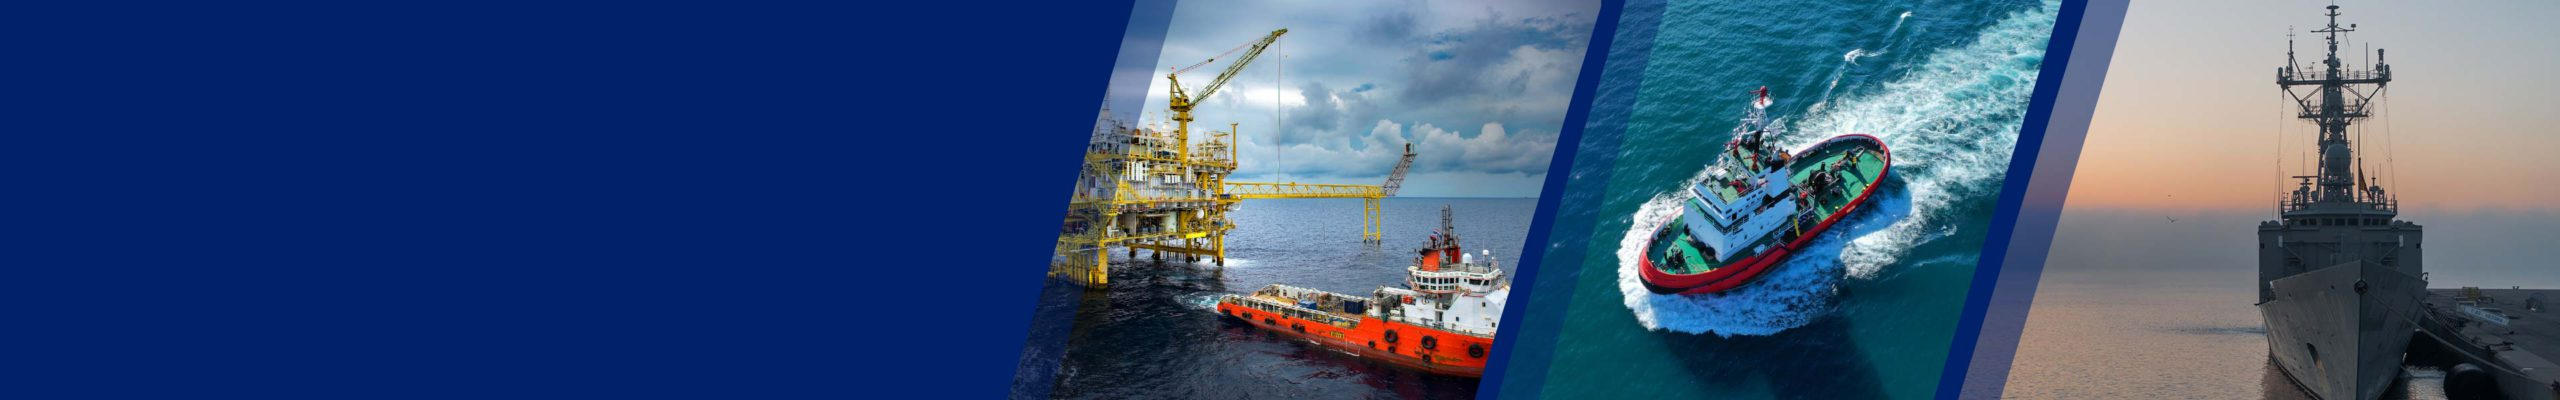 Seacoast | Naval & Shipboard